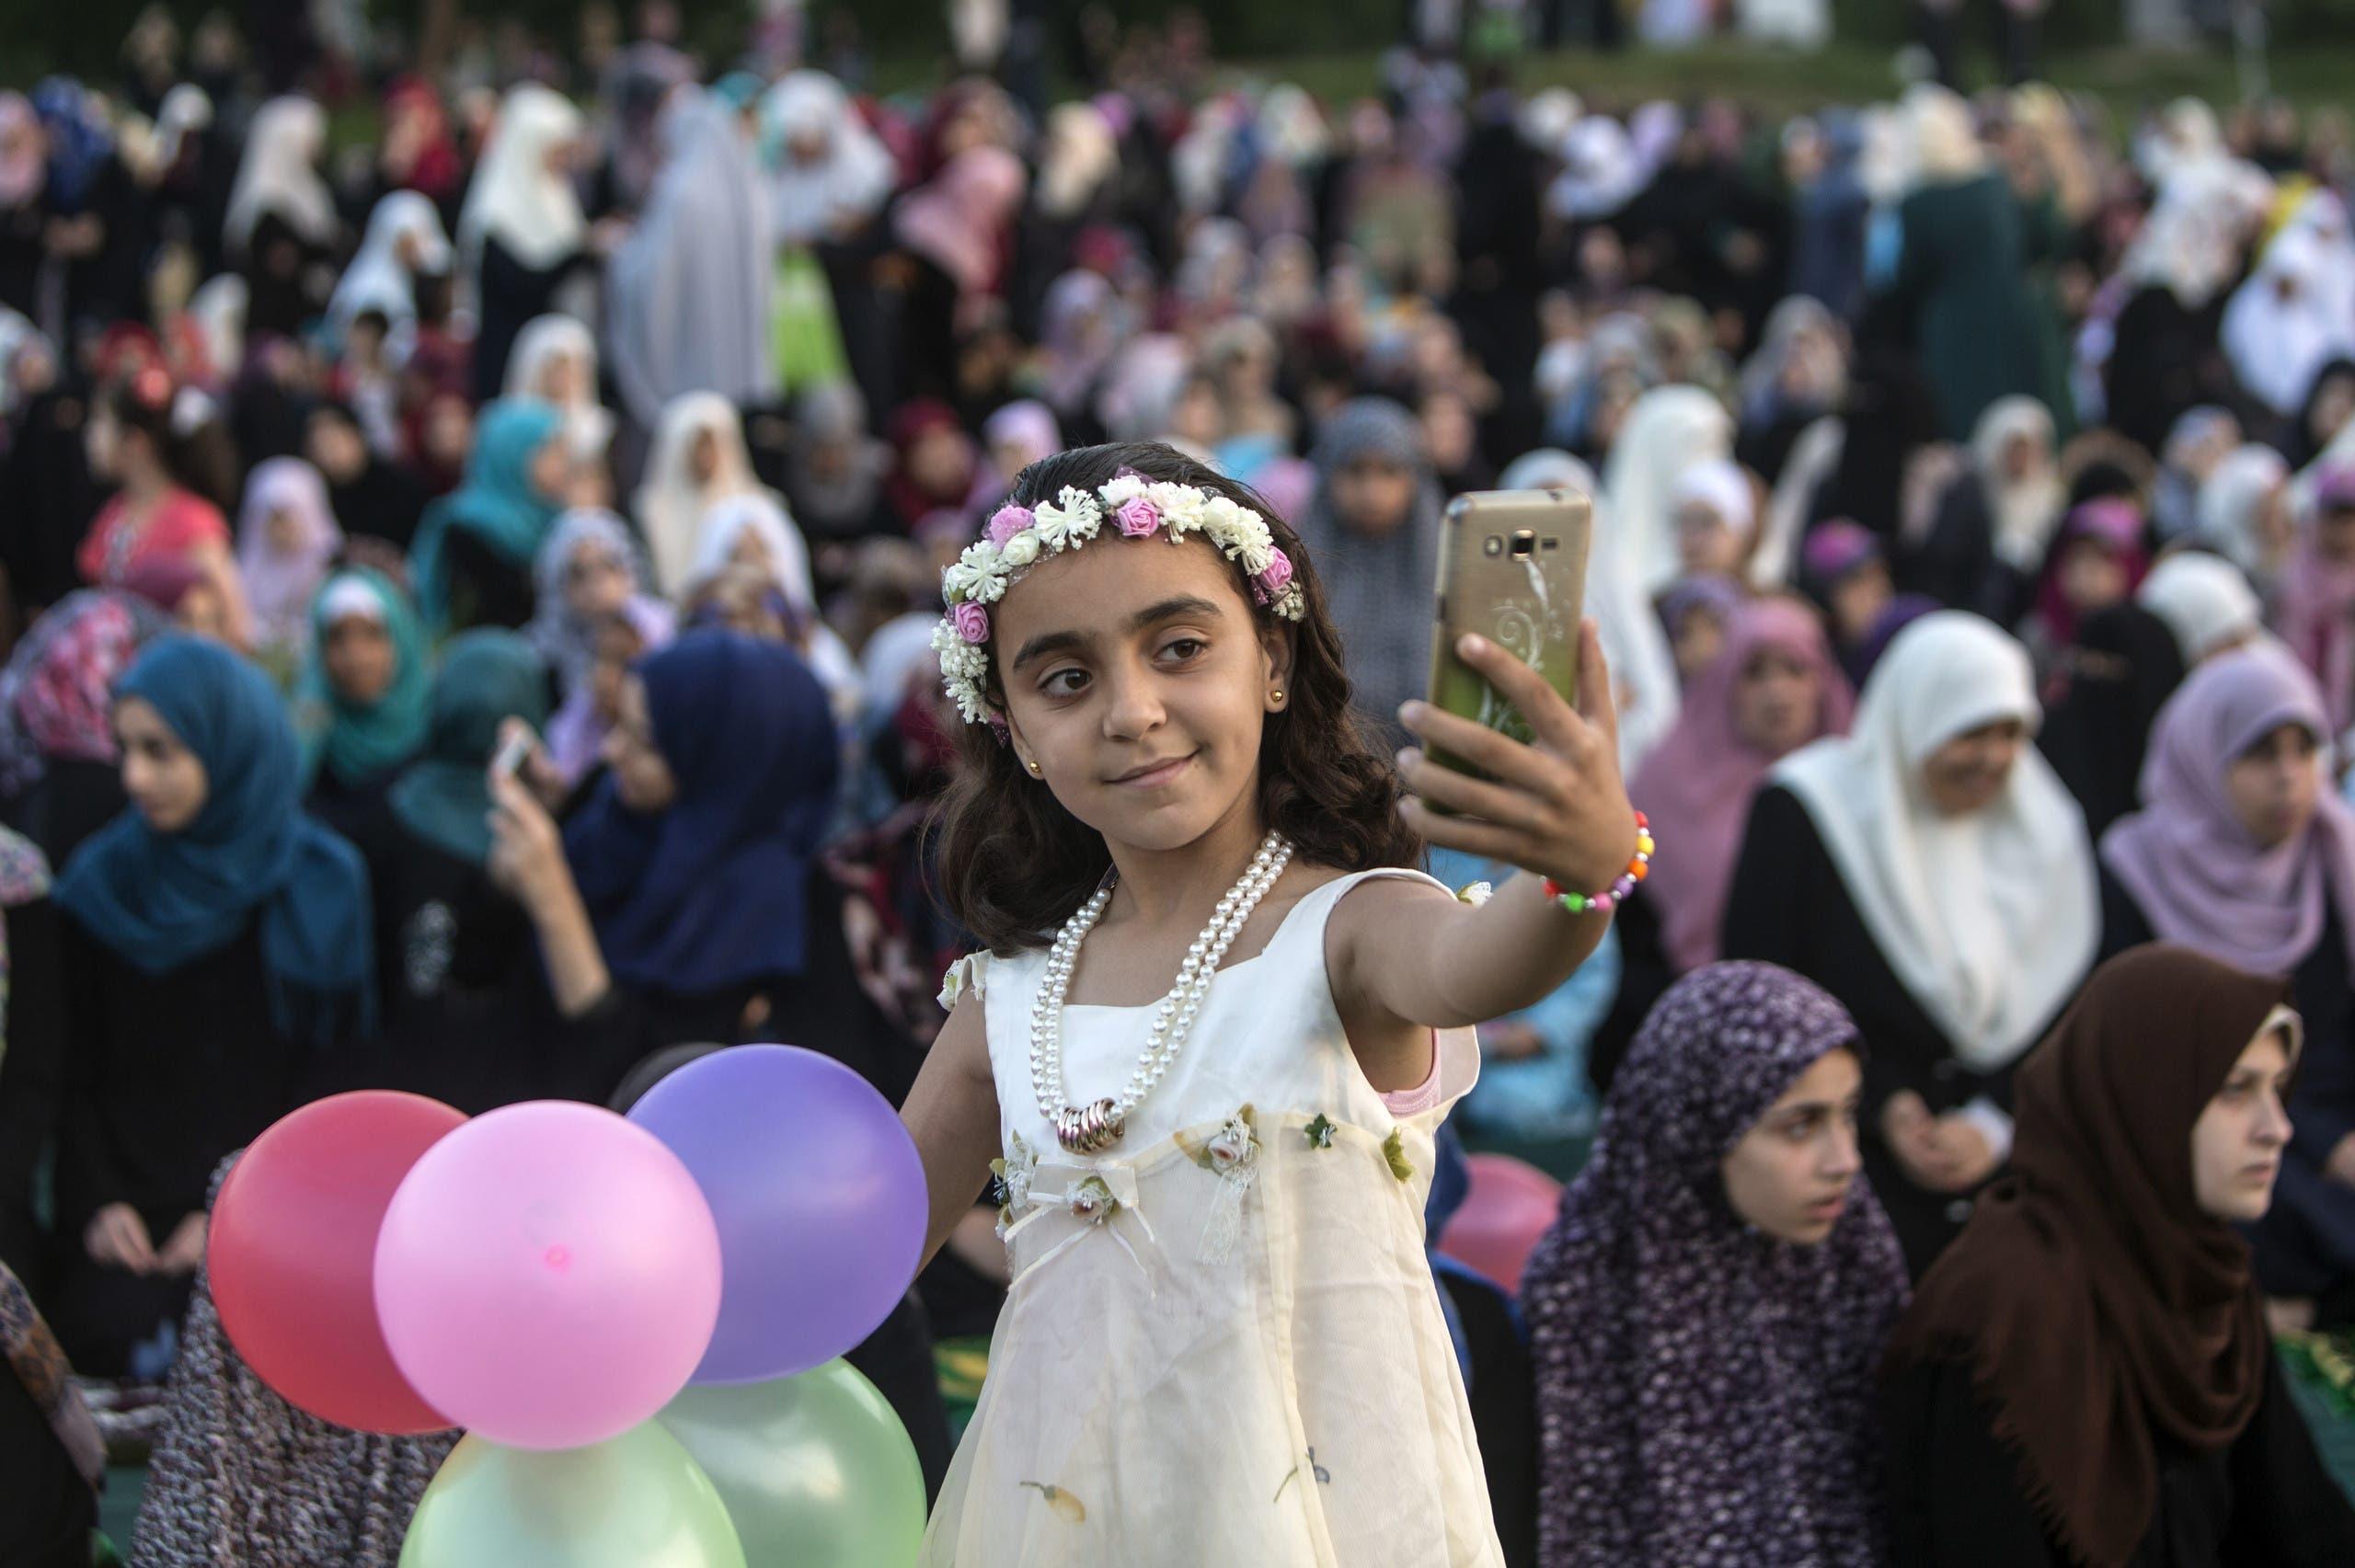 Cool Gaza Eid Al-Fitr 2018 - 74e14345-6424-4a90-958c-6b4cc0438384  Pic_55899 .jpg